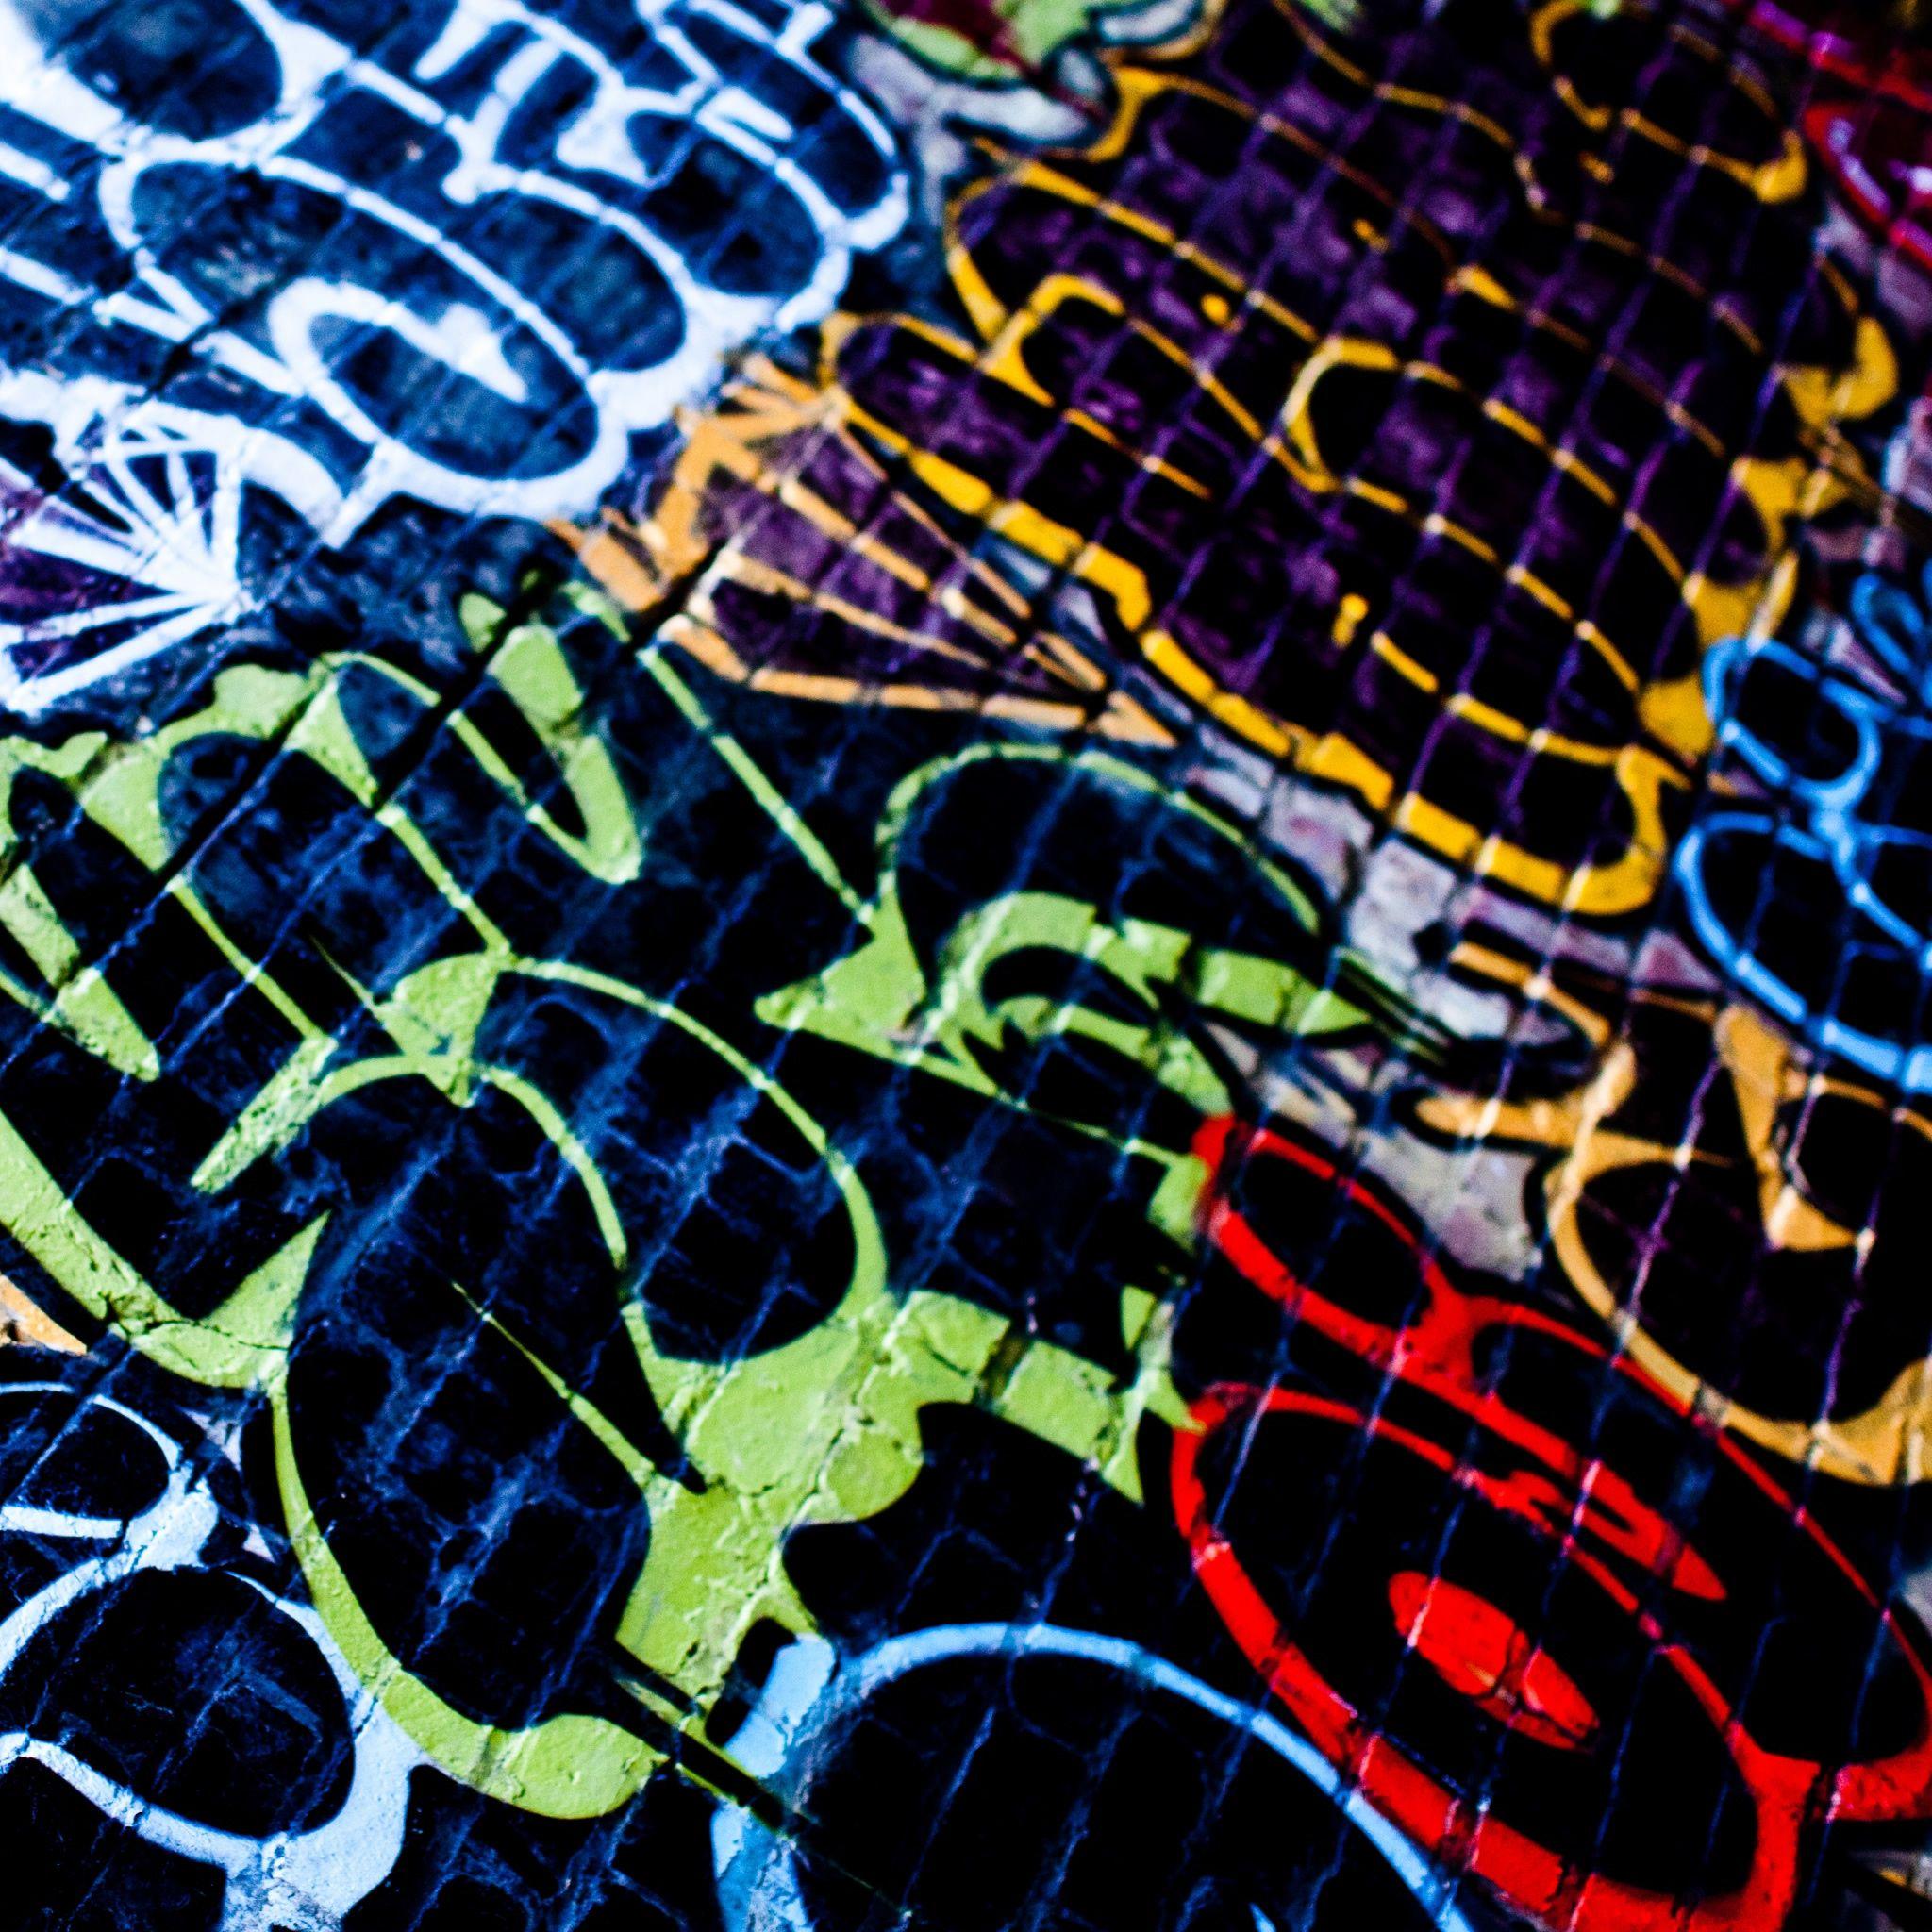 Graffiti Wallpaper Funky Designs to Customize Your Desktop | HD ...